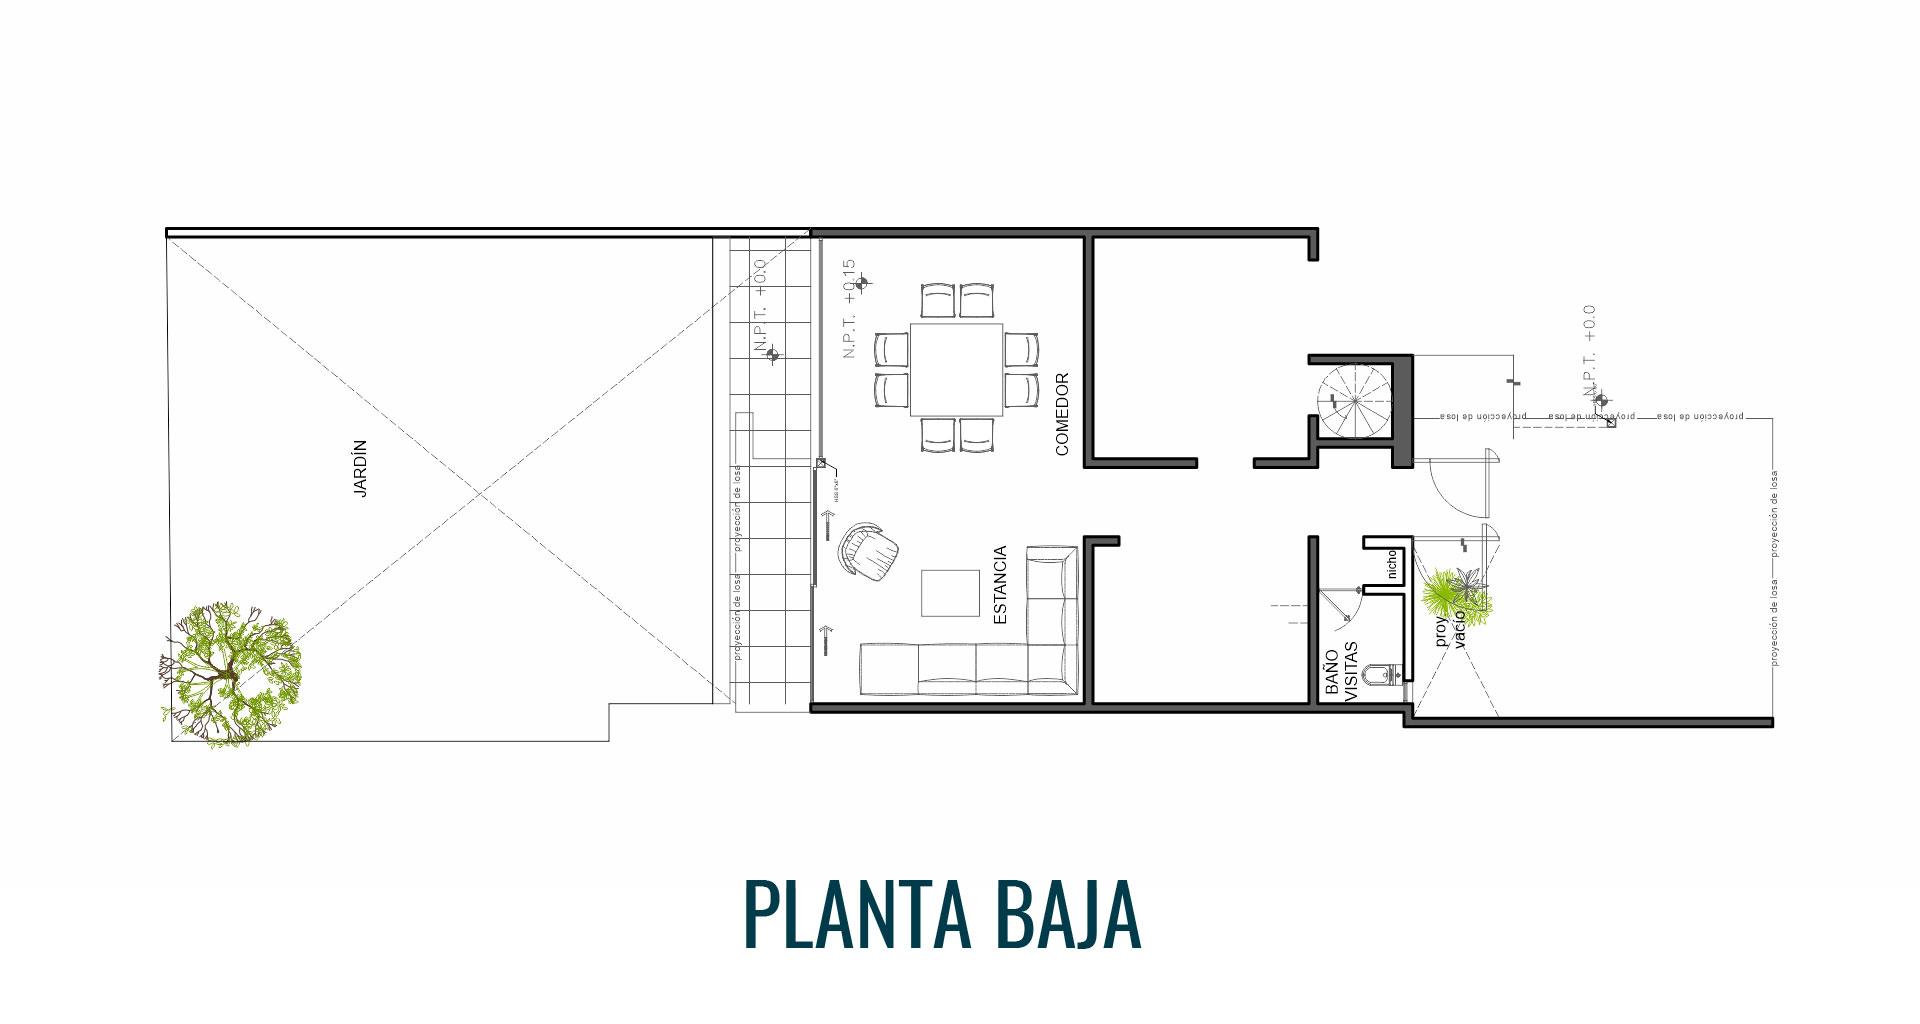 Margaritas 339 residencial Mexihom residencia 1 planta baja